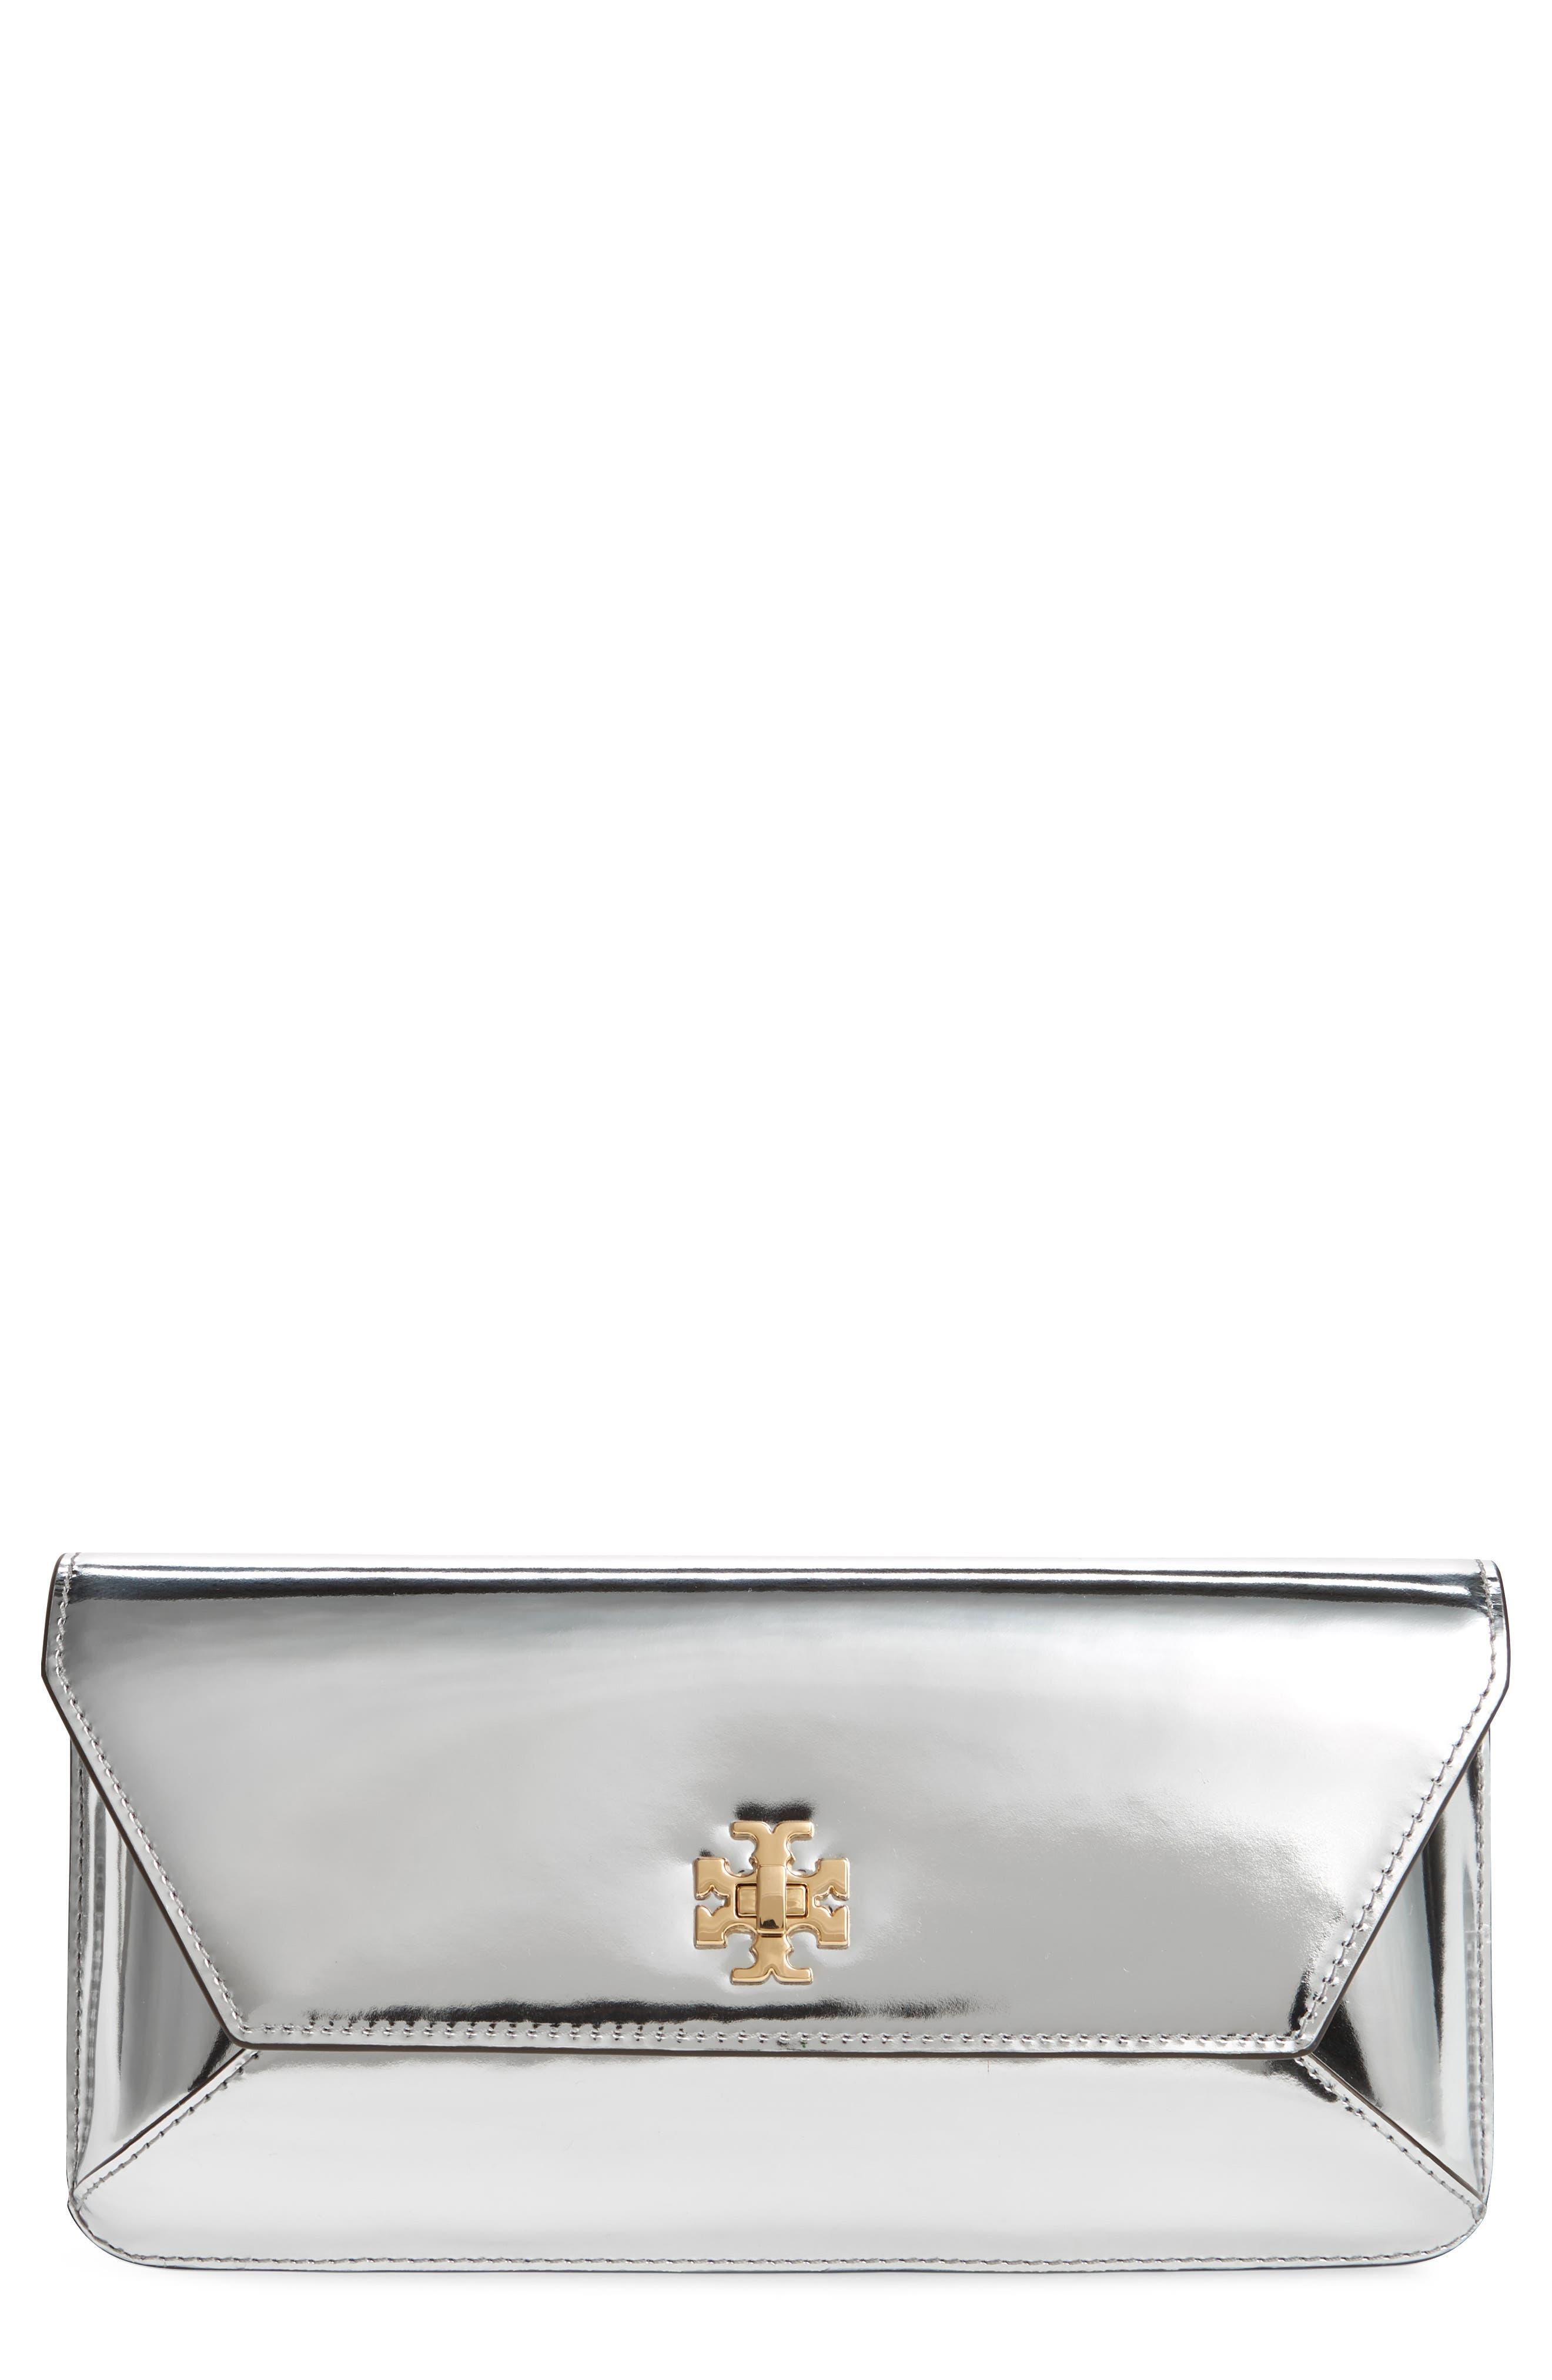 Kira Leather Envelope Clutch,                             Main thumbnail 1, color,                             Mirror Metallic Silver